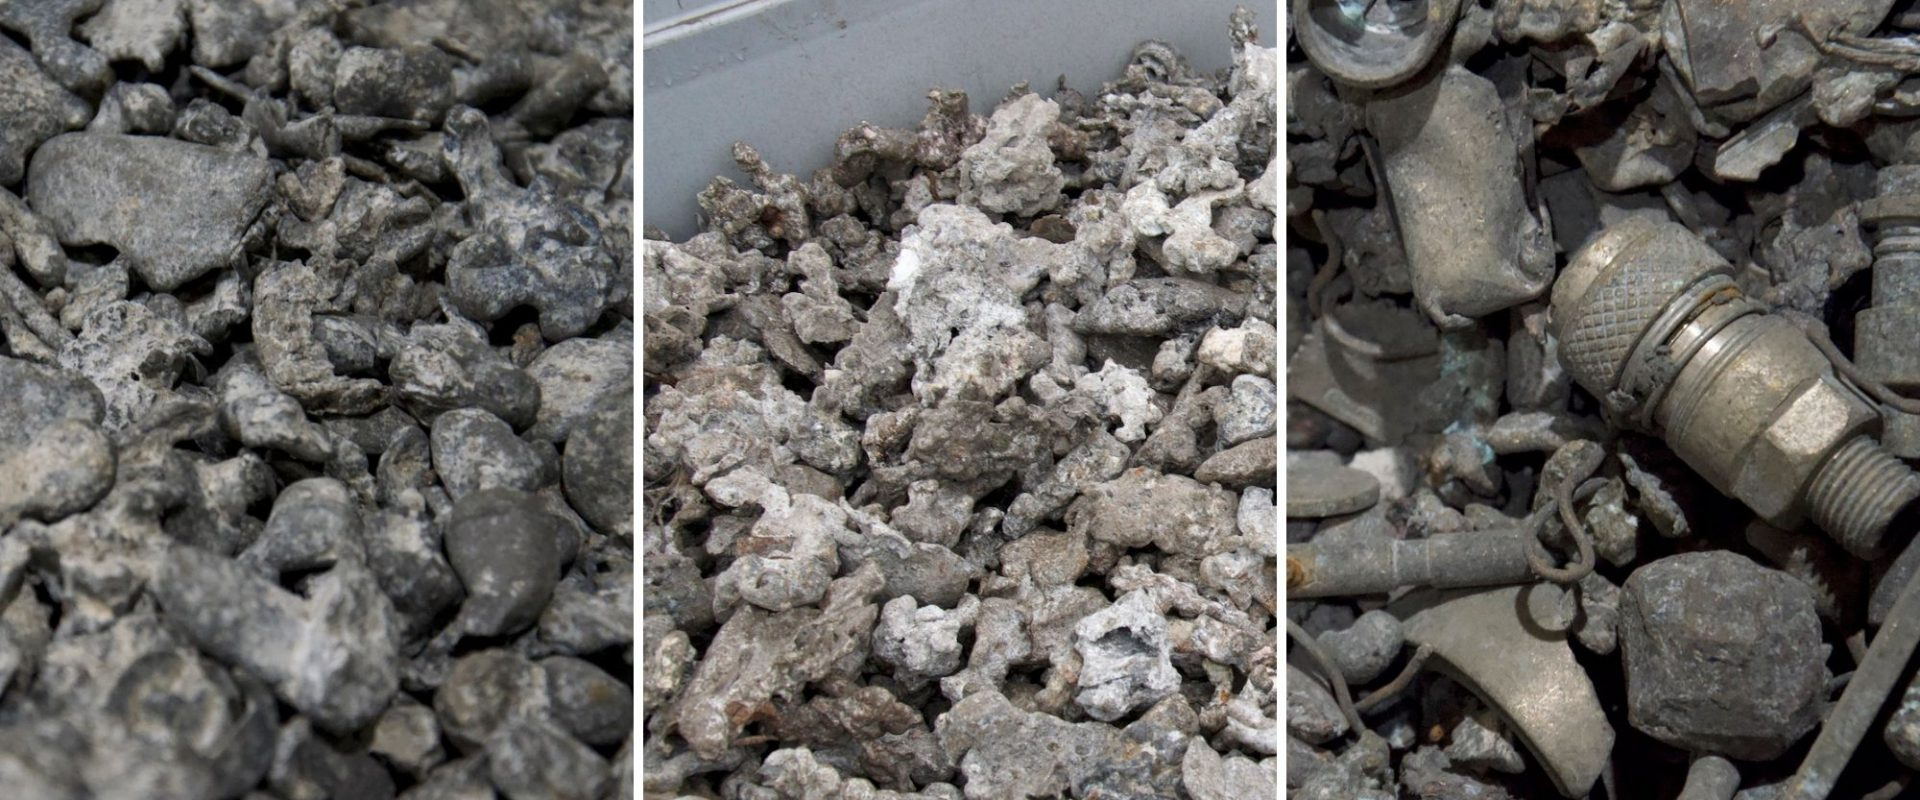 Aluminium-copper-zink